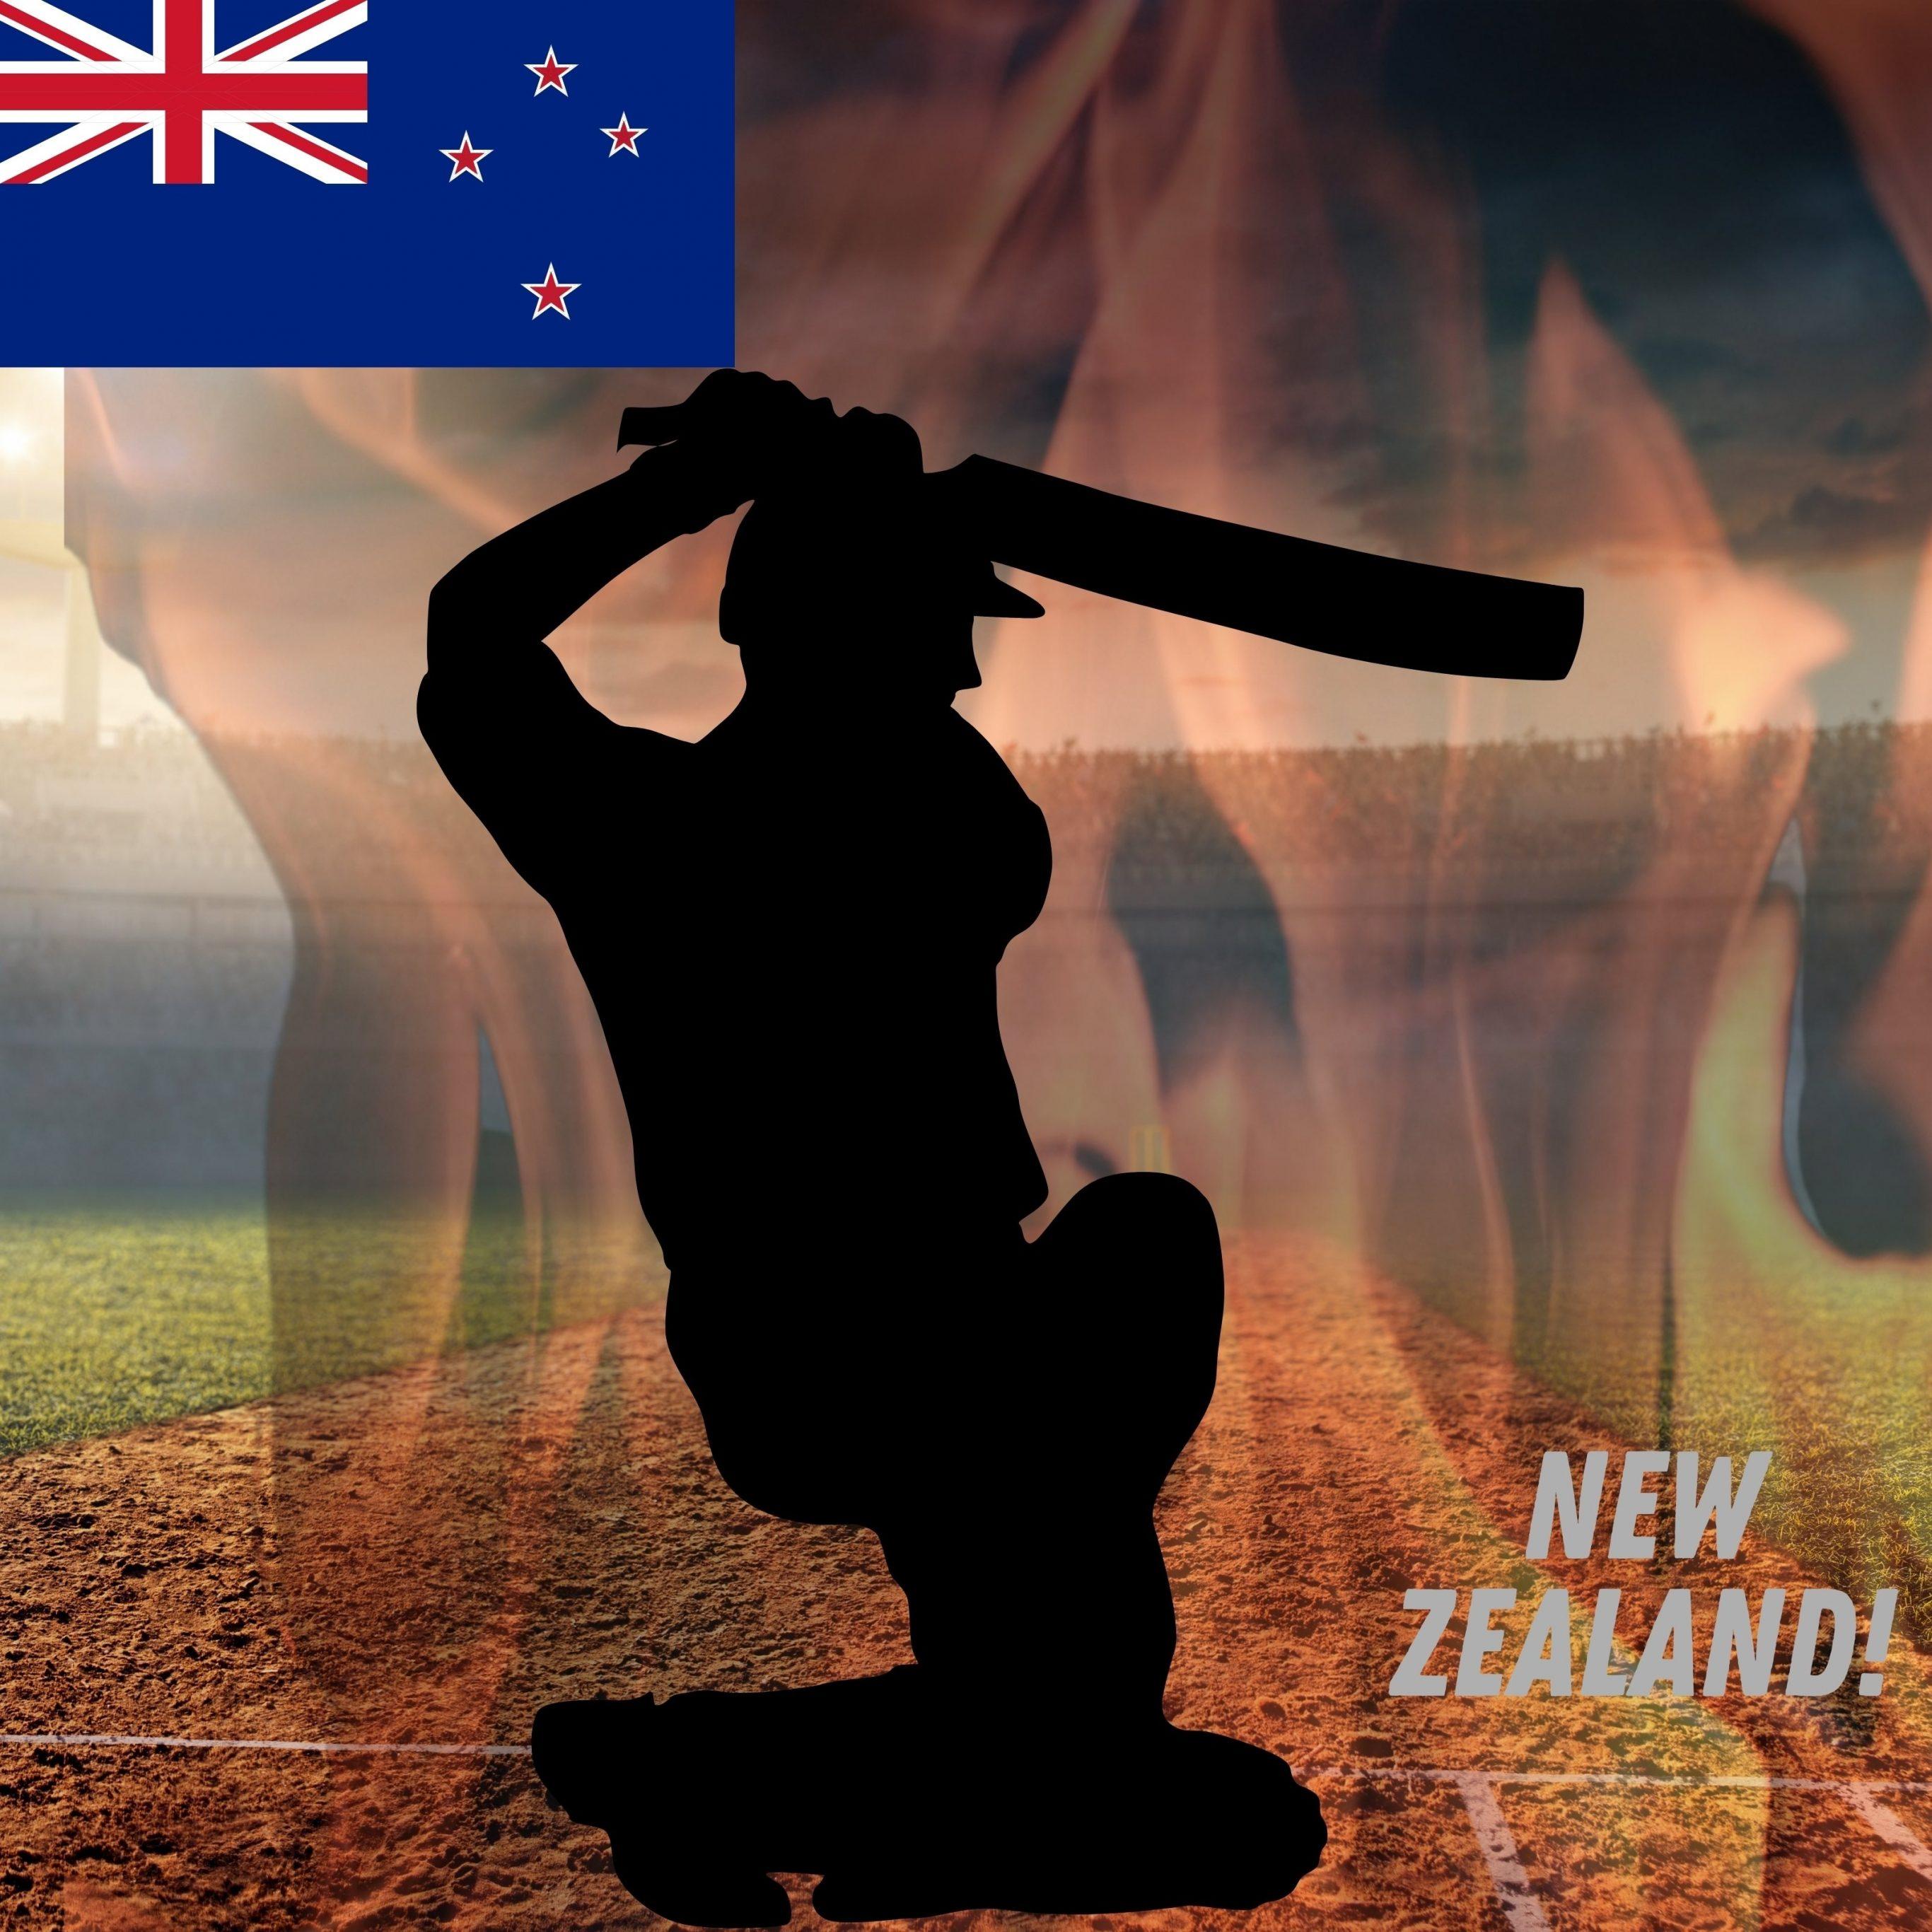 2732x2732 wallpapers 4k iPad Pro New Zealand Cricket Stadium iPad Wallpaper 2732x2732 pixels resolution